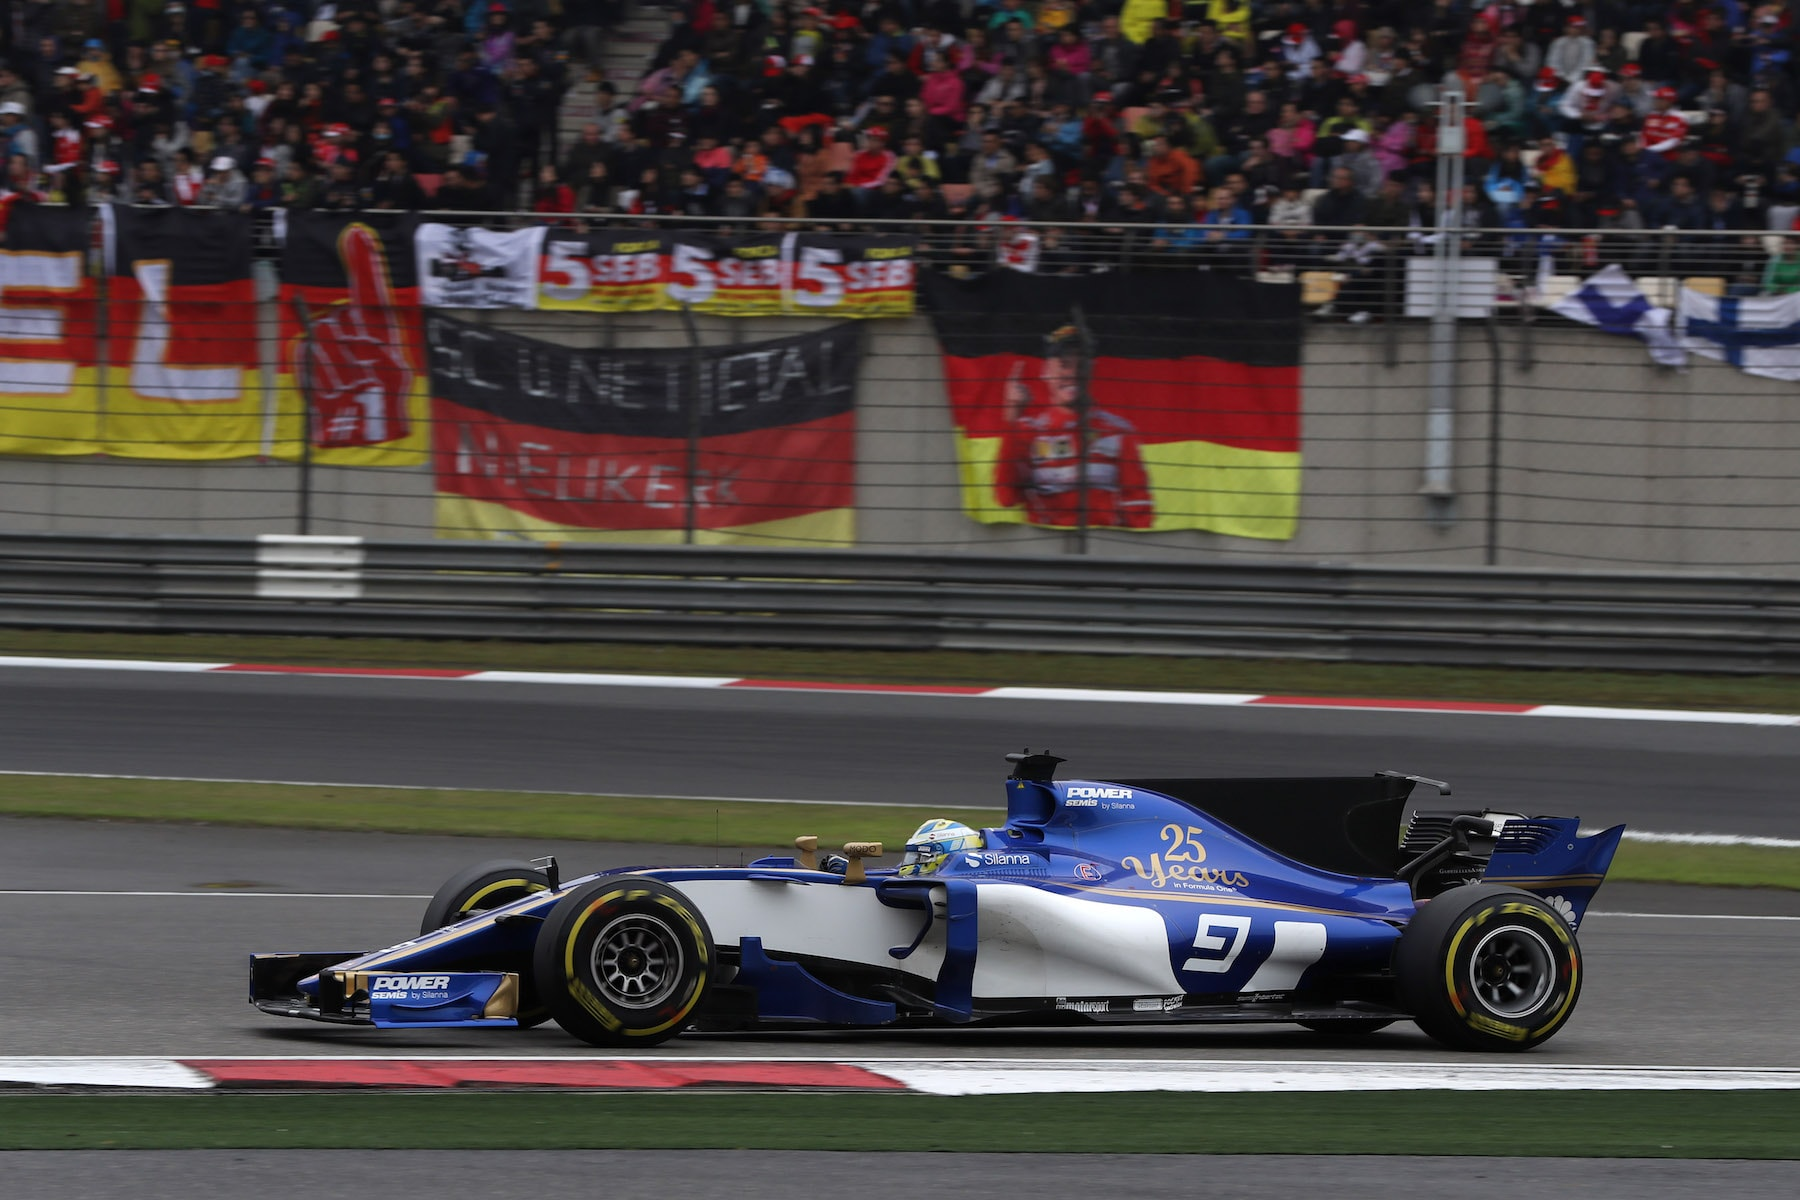 G 2017 Marcus Ericsson | Sauber C36 | 2017 Chinese GP P15 1 copy.jpg